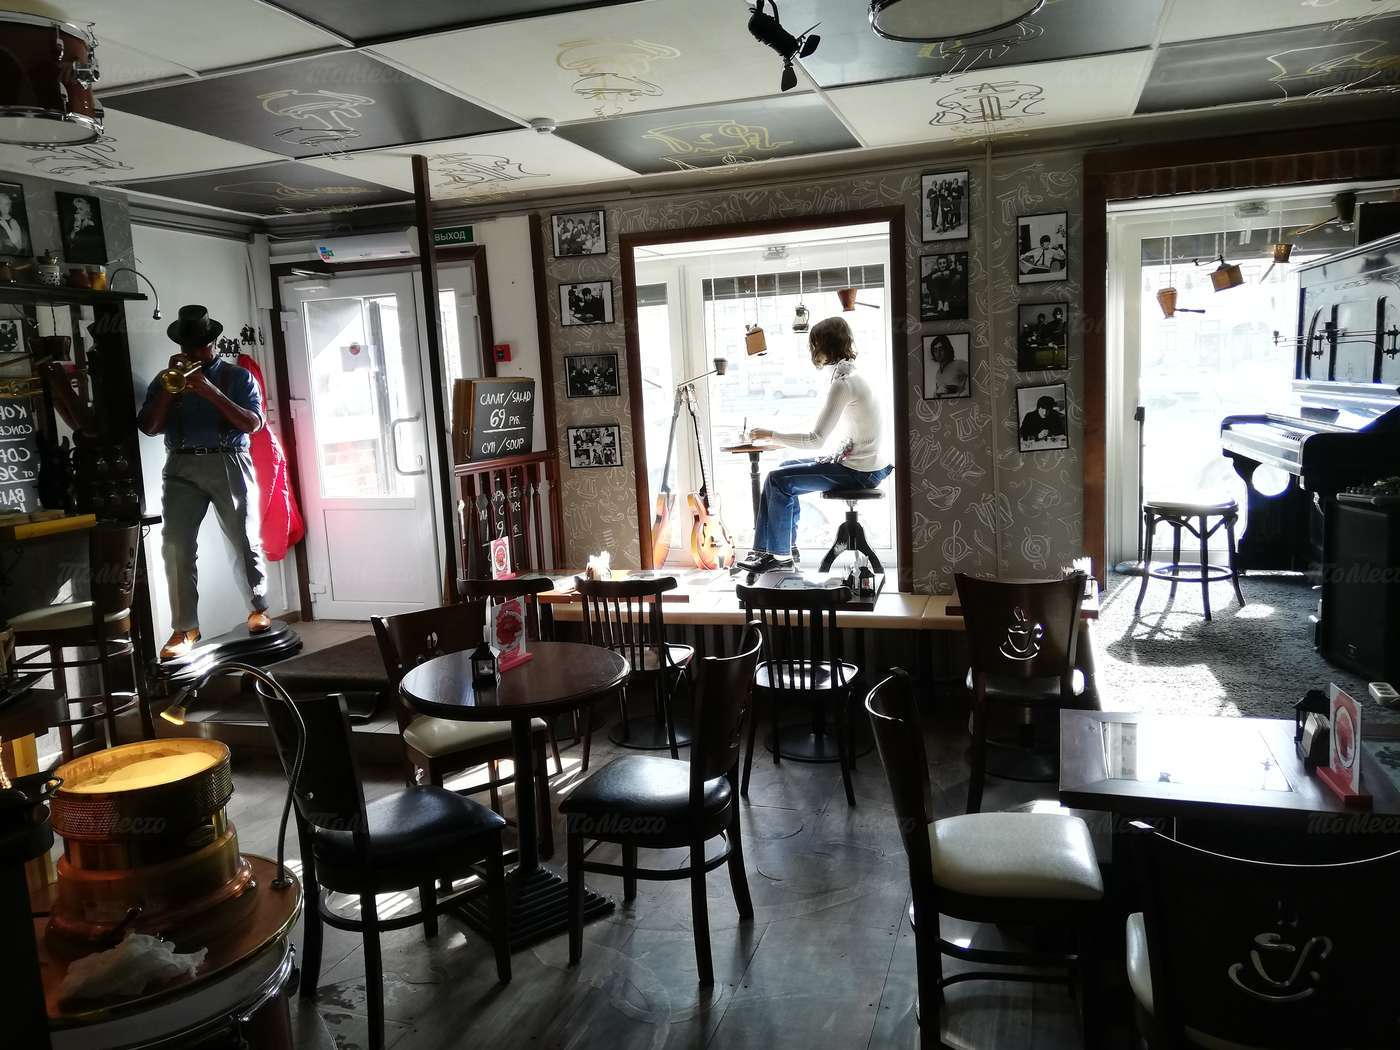 Кафе Музыка кофе на набережной реки Фонтанки фото 5